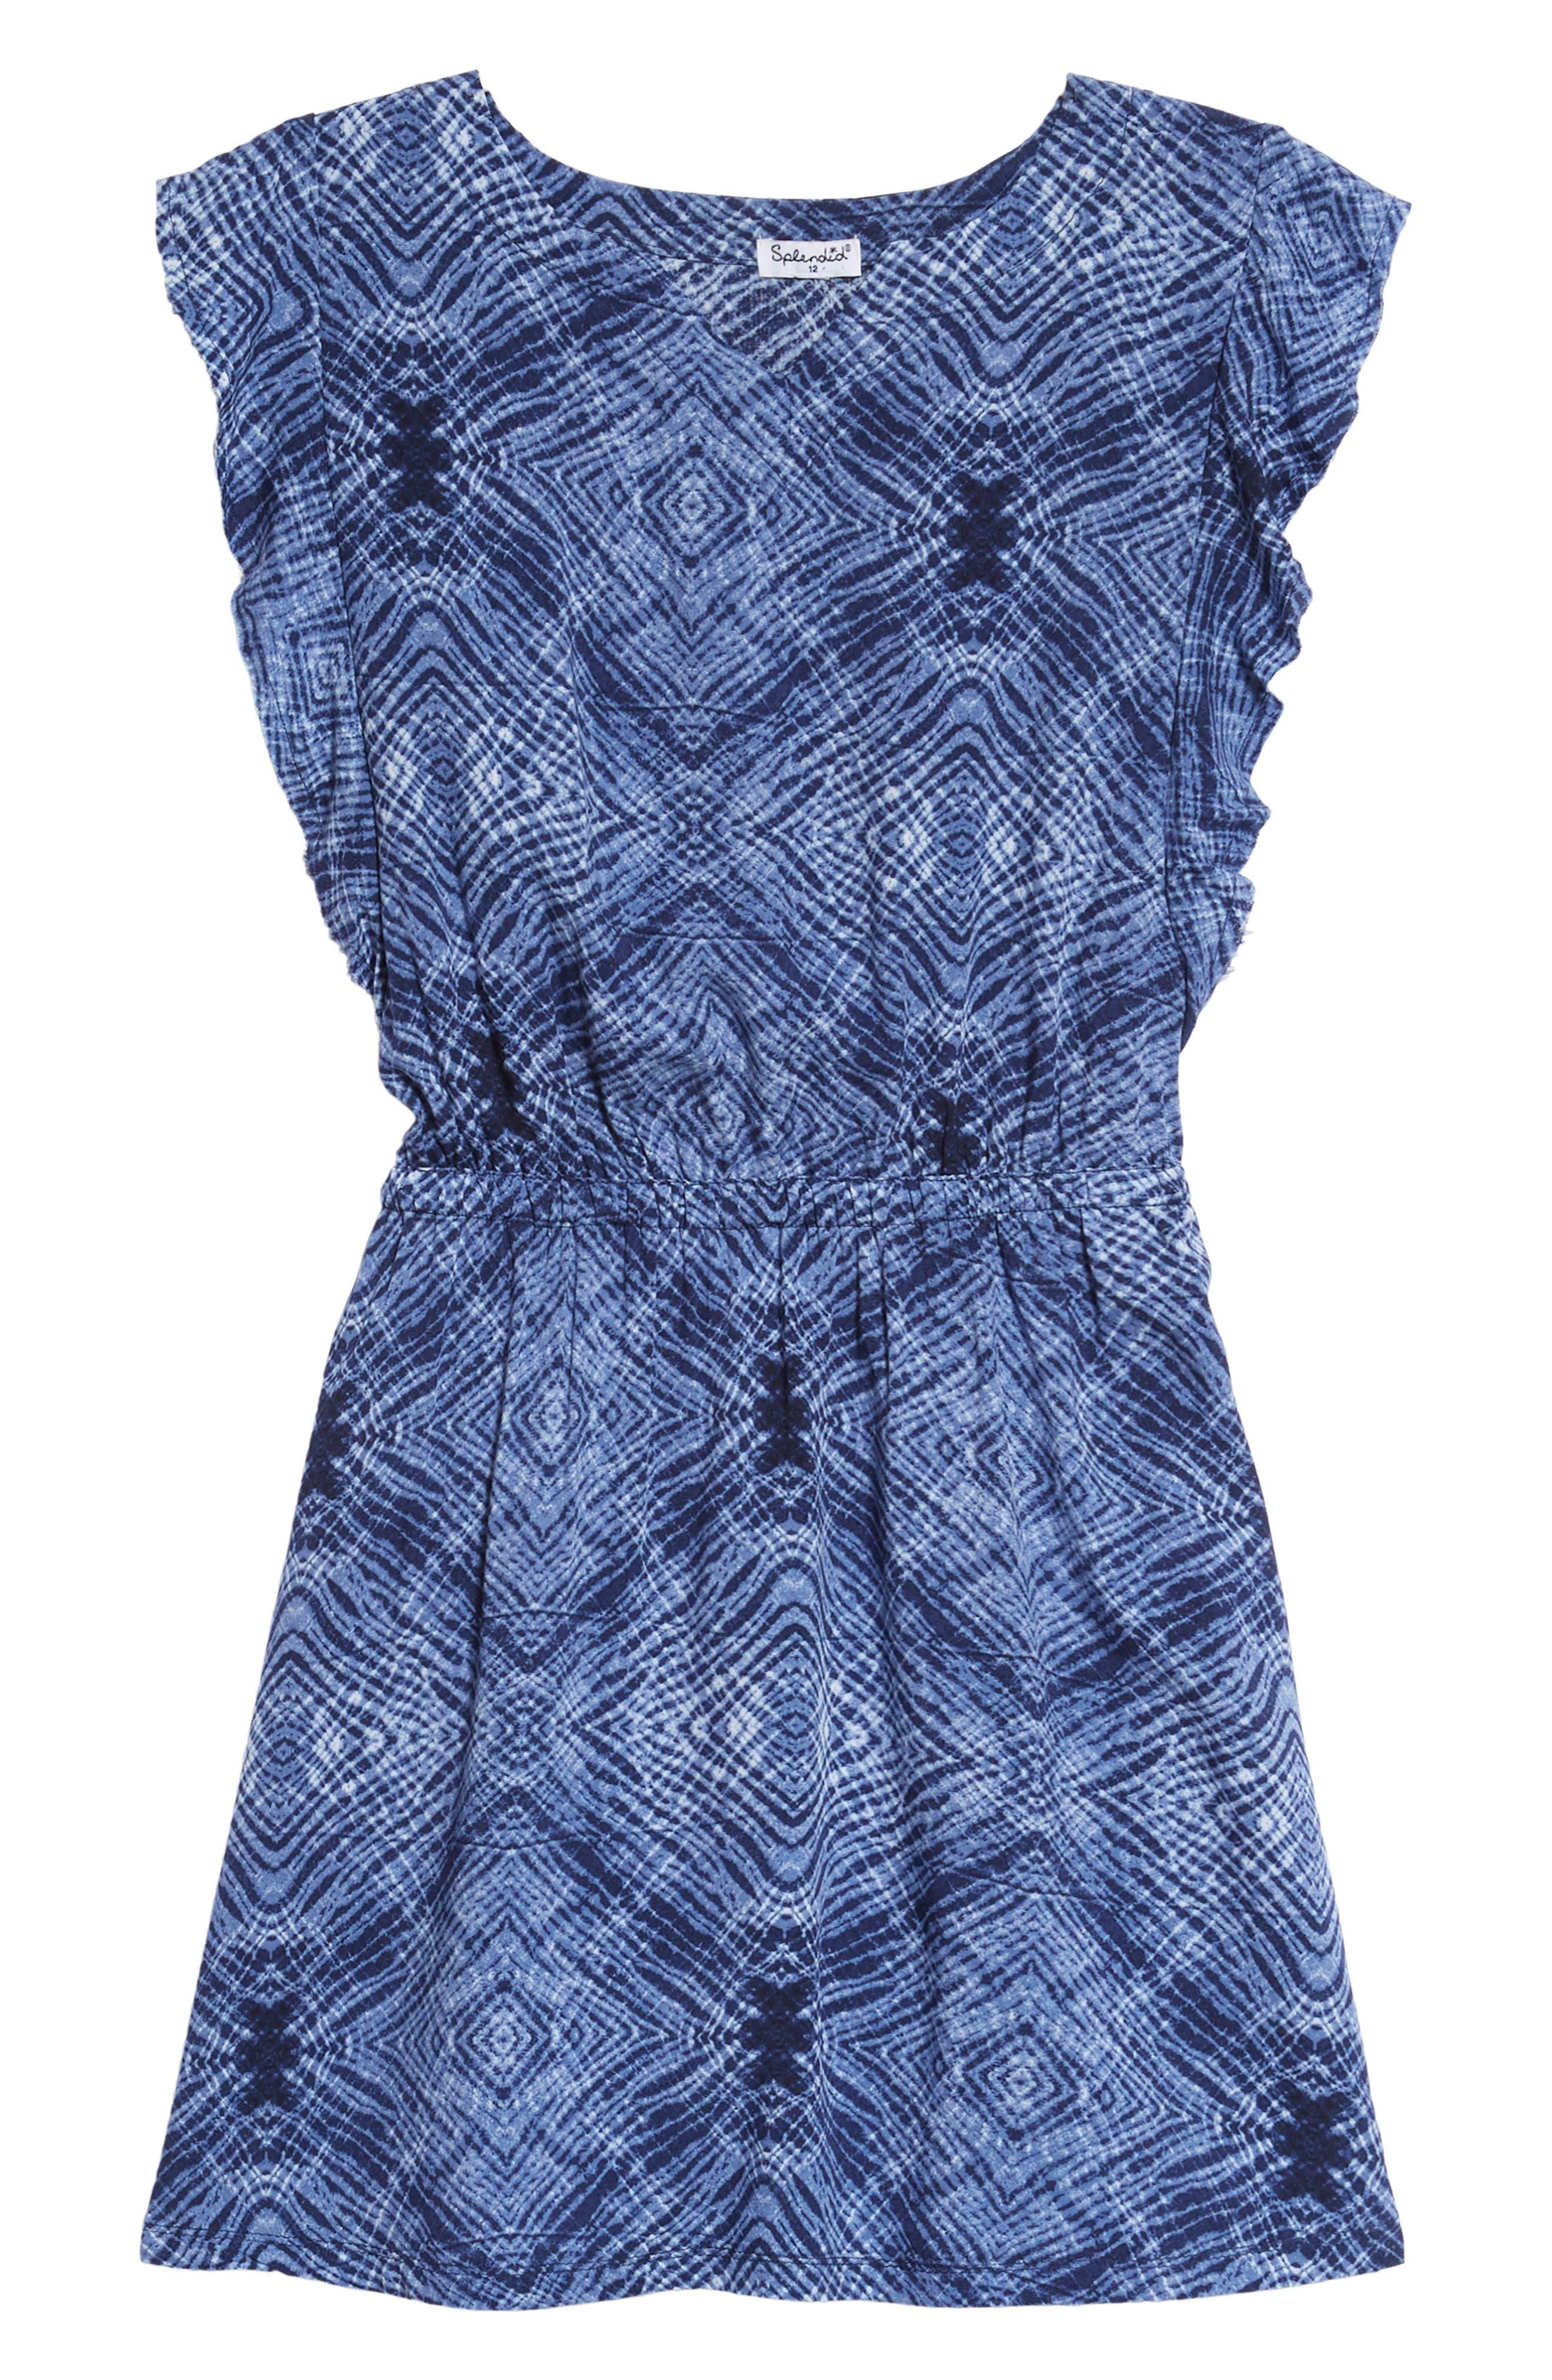 Print Voile Dress,                             Main thumbnail 1, color,                             Navy